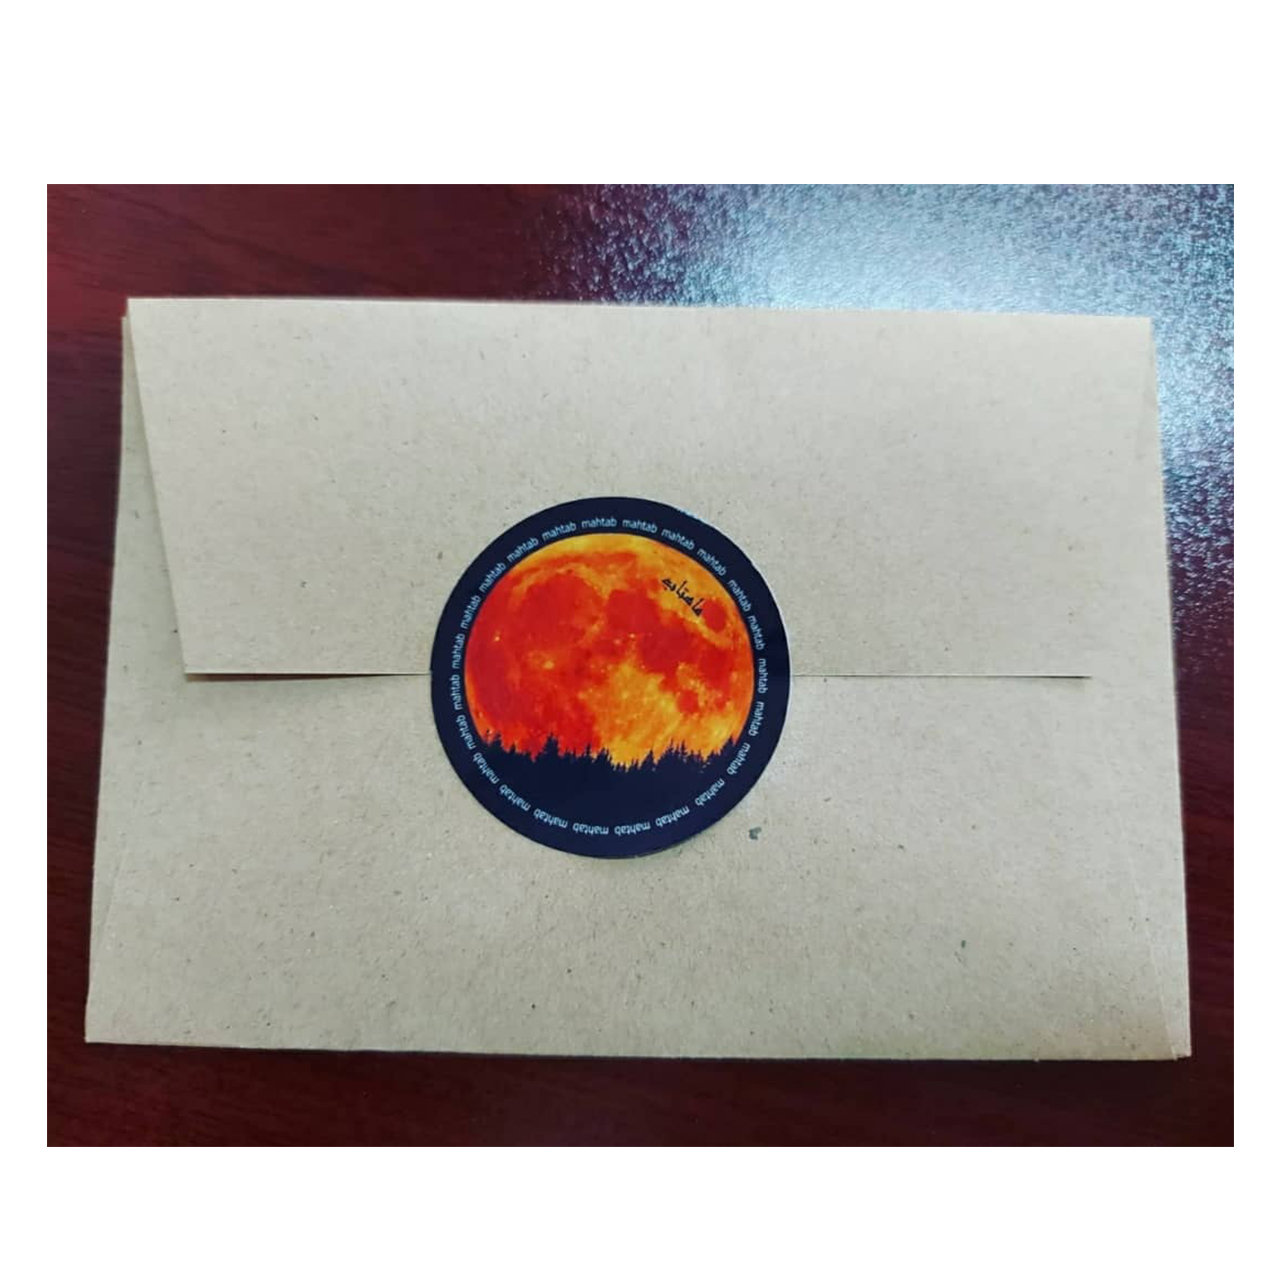 کارت پستال ماهتاب طرح دوست دارم عشق کد 1900